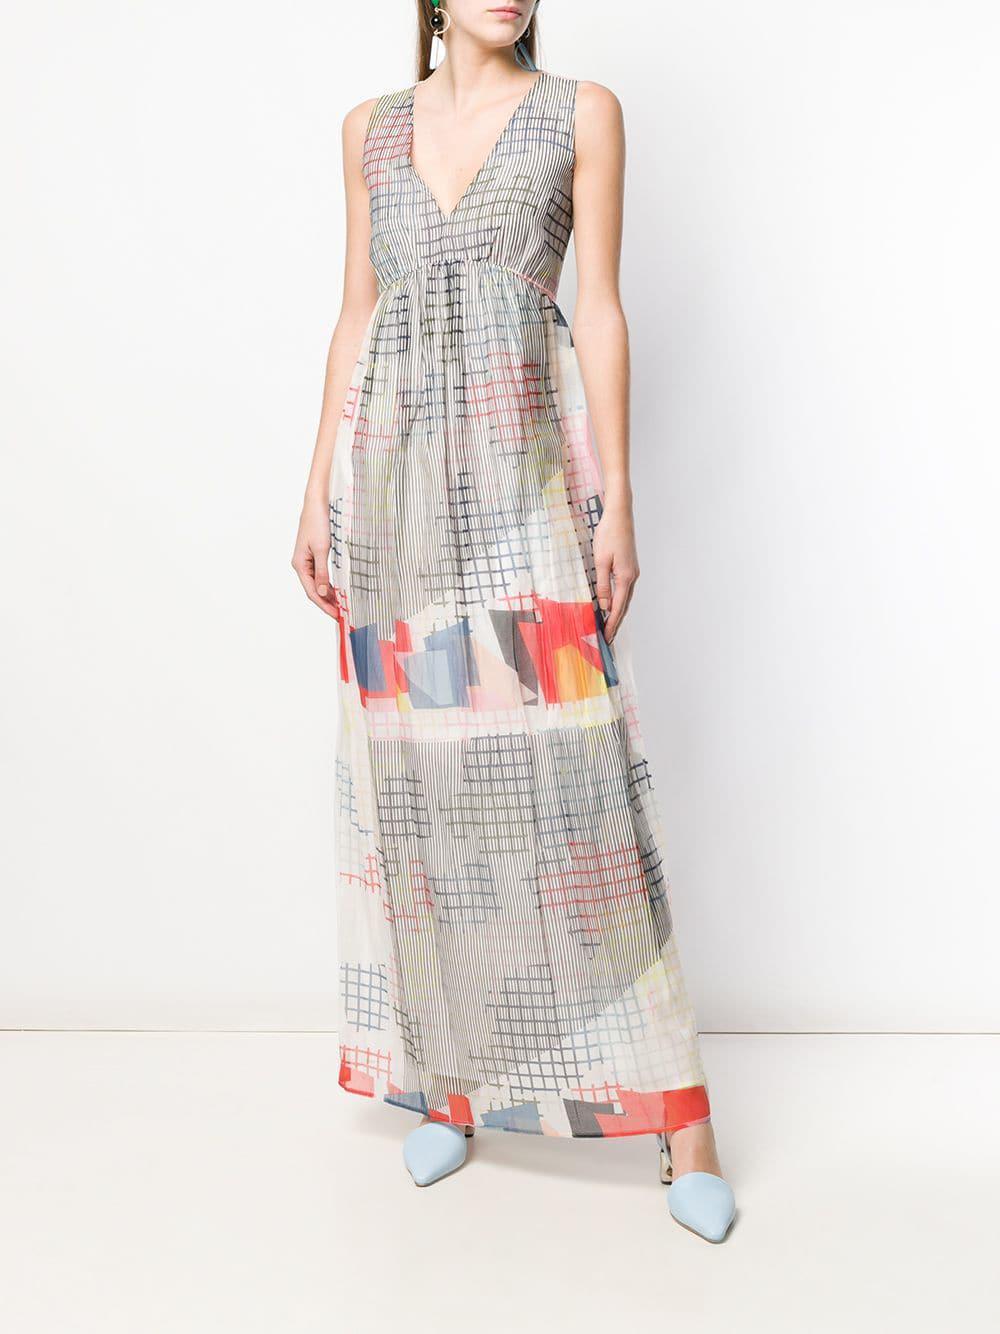 7b1f61d4f03a Lyst - Emporio Armani V-neck Geometric Print Dress in White